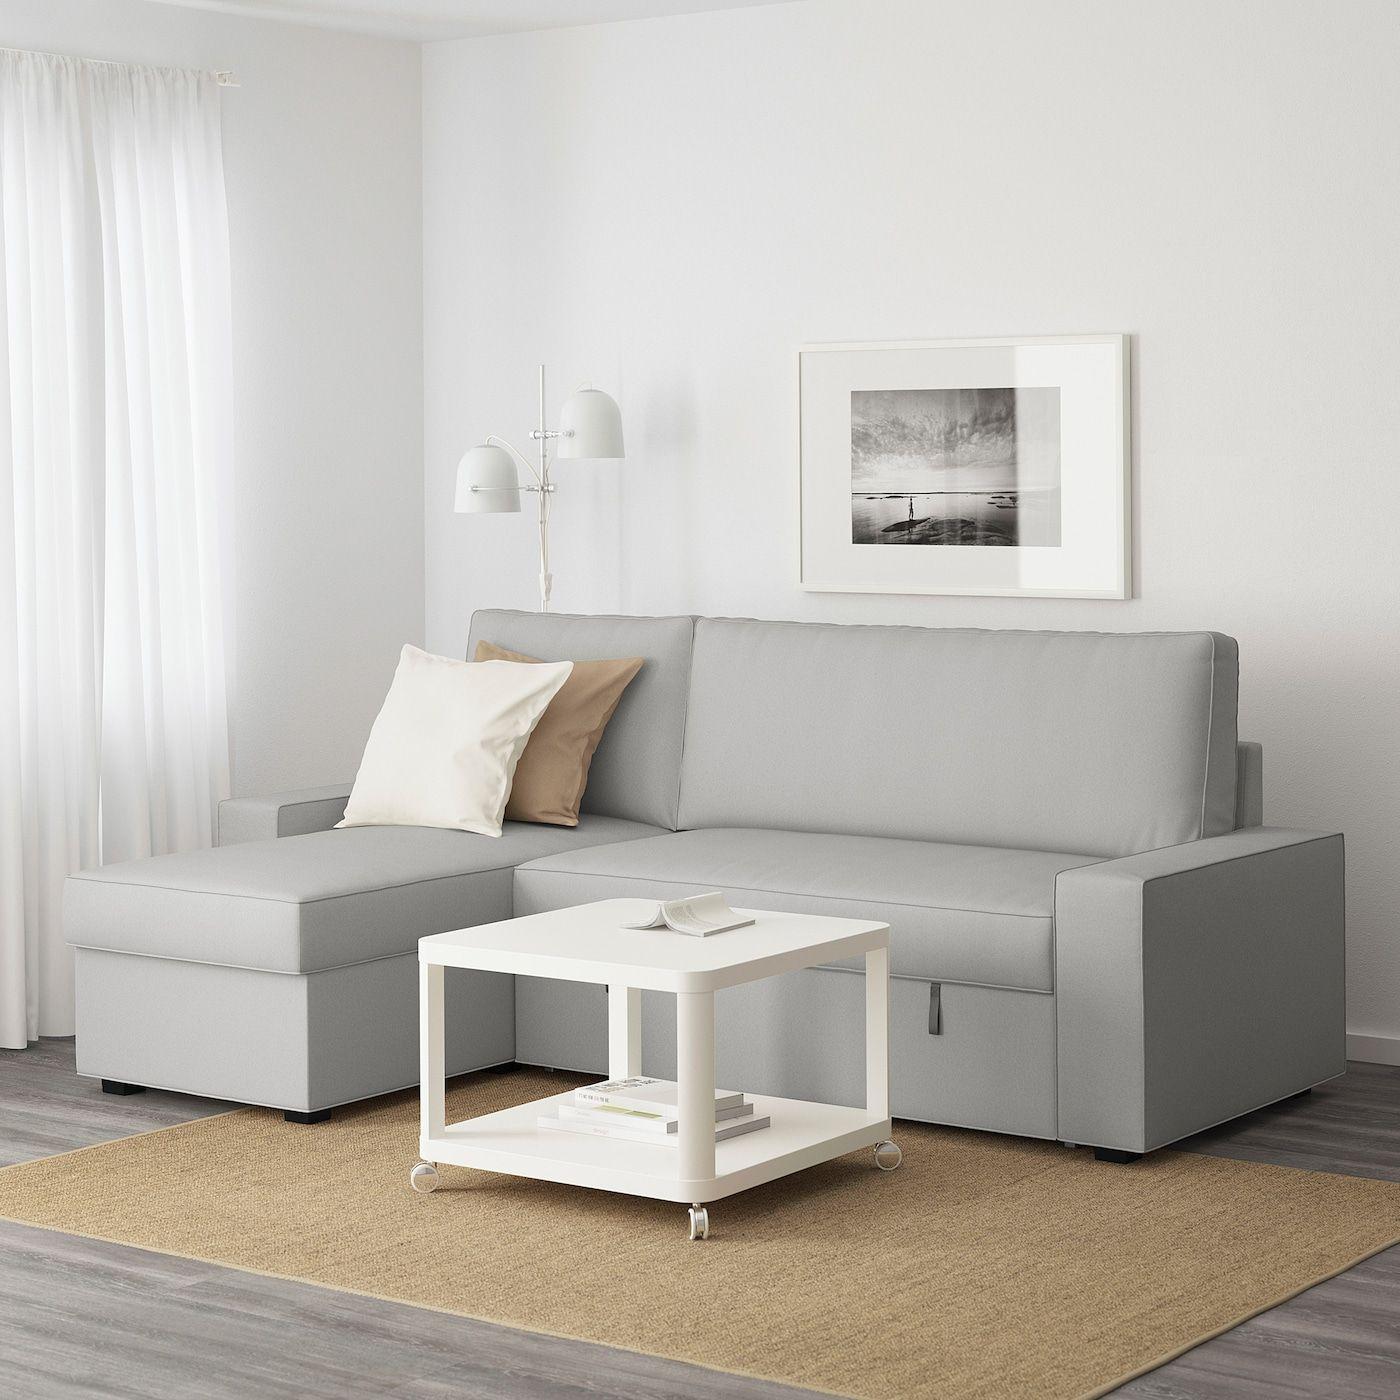 VILASUND Sofá cama con chaiselongue, Orrsta gris claro